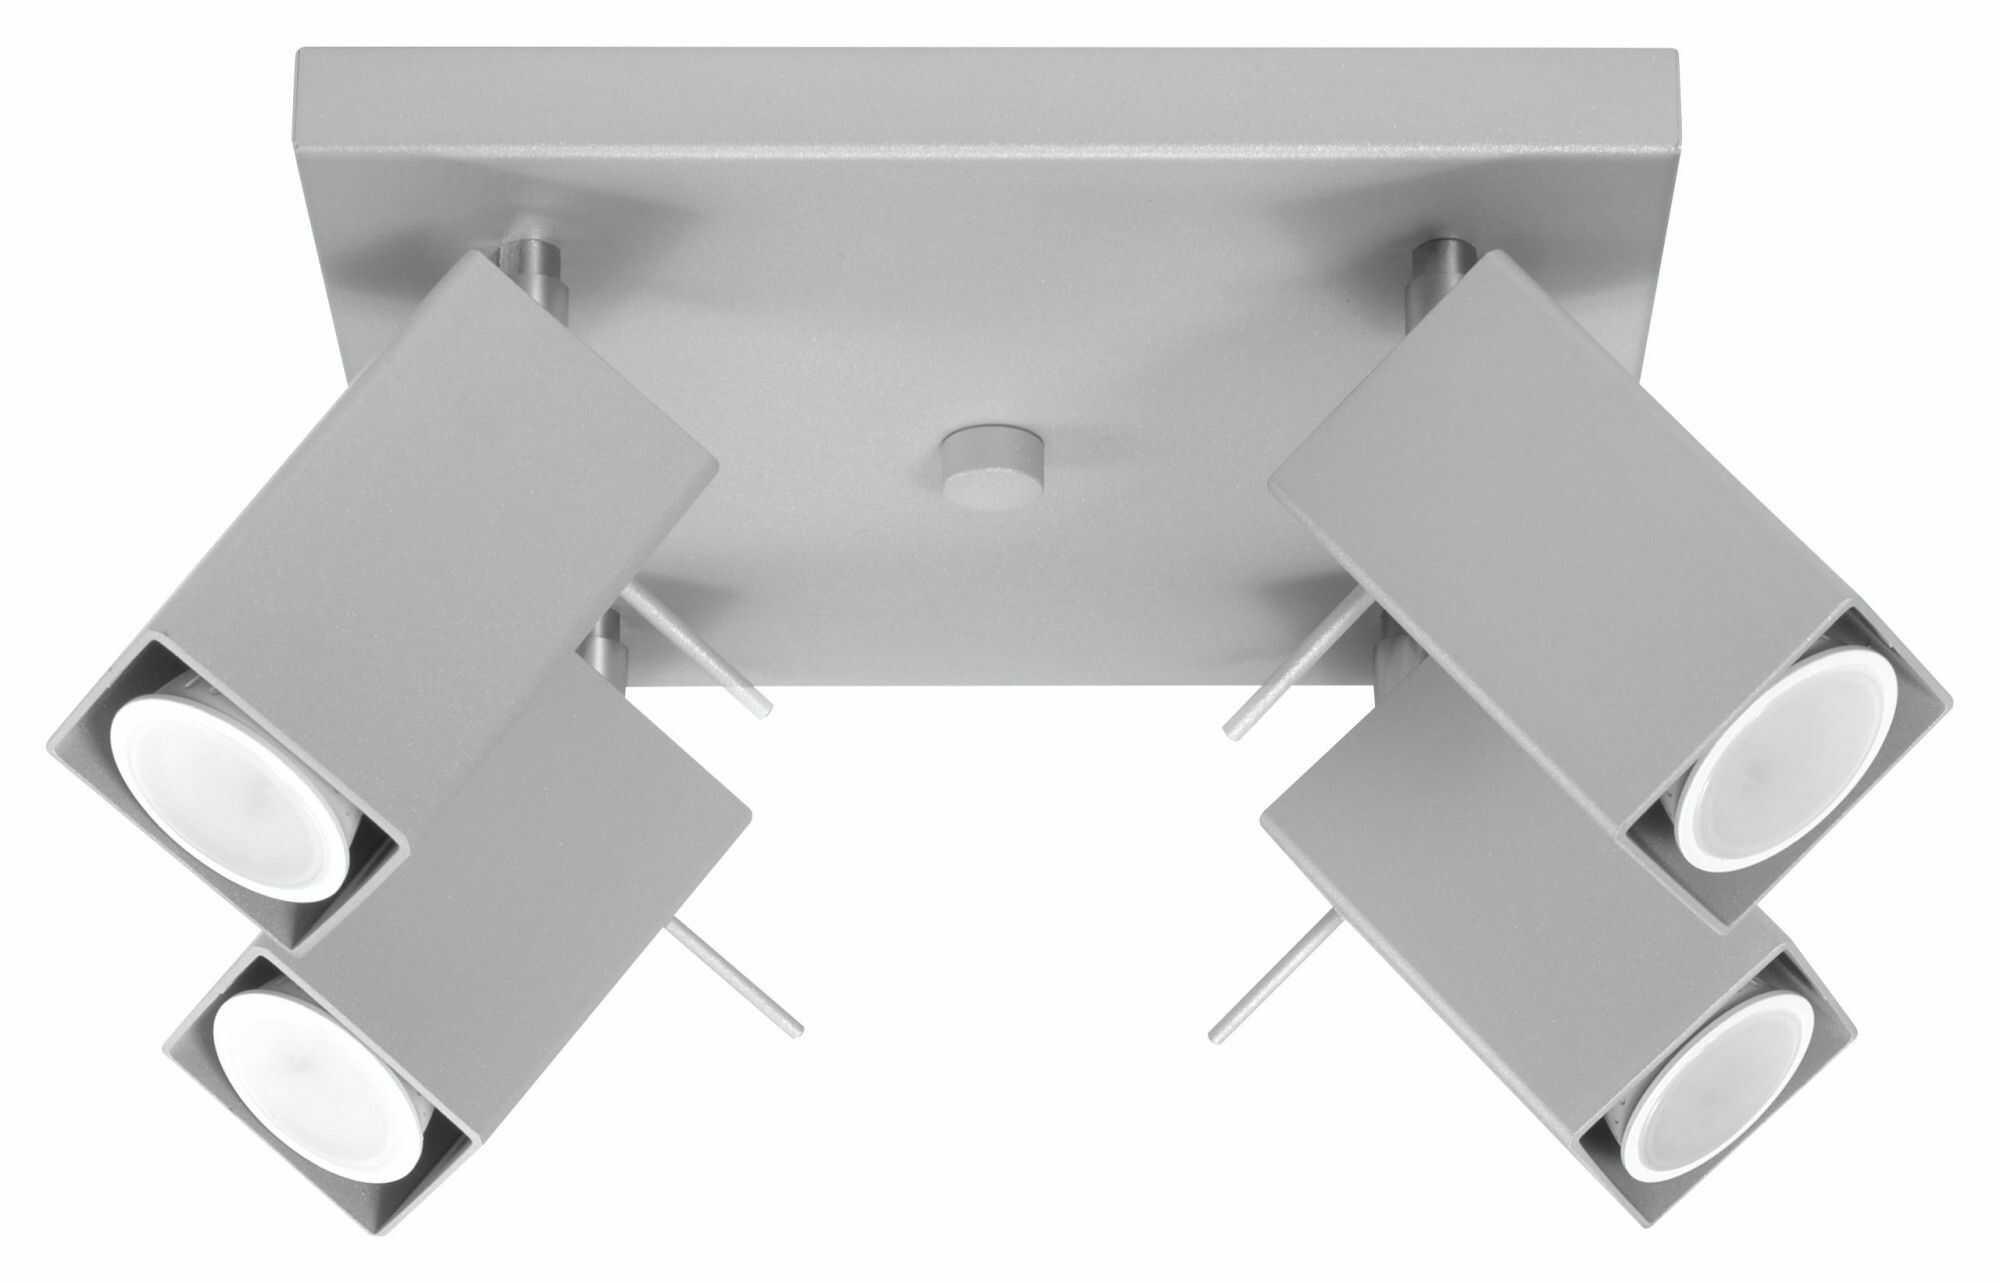 Łazienkowy plafon LED E789-Merids - szary